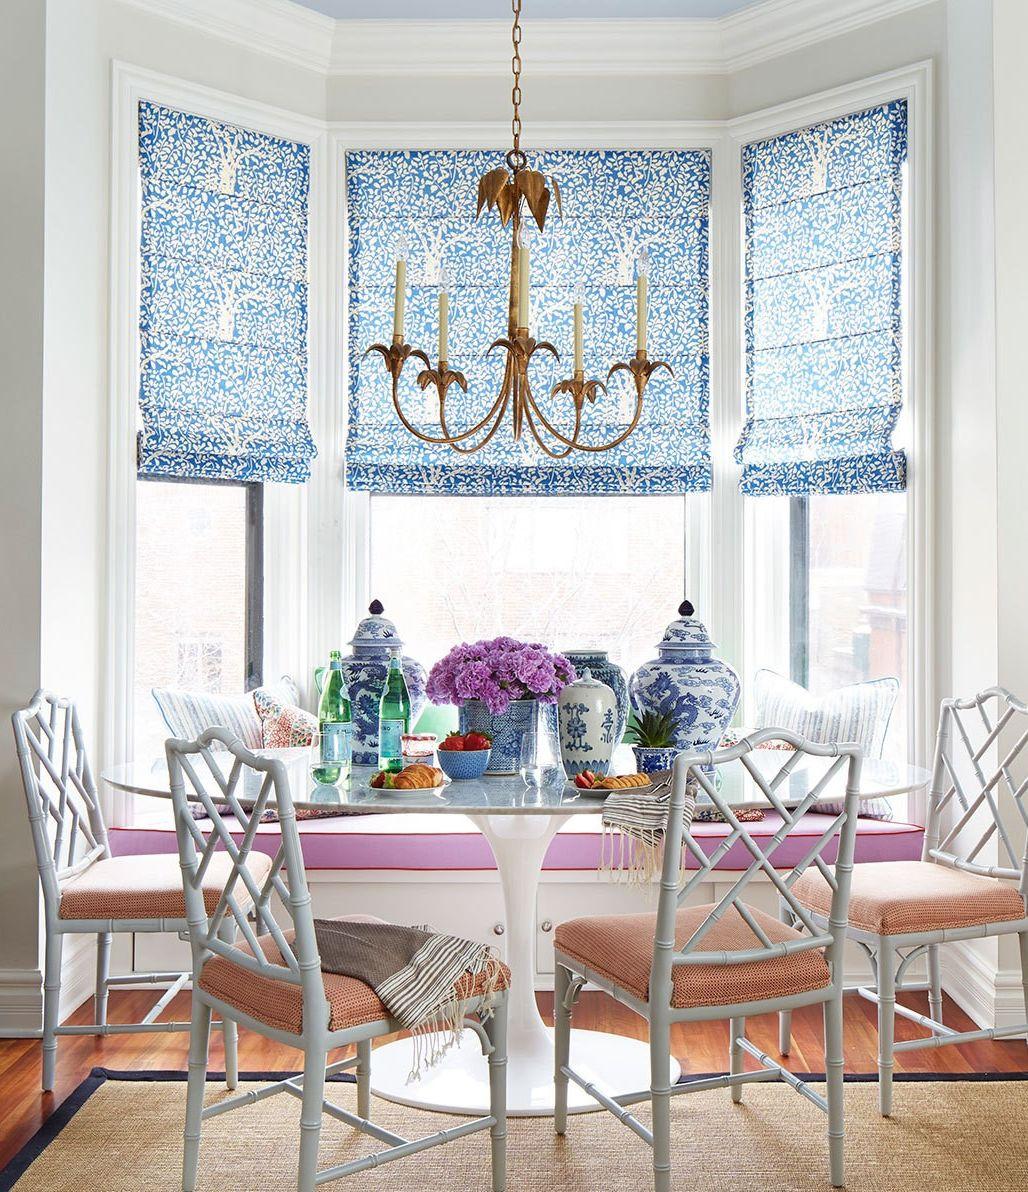 China Seas Arbre de Matisse Reverse window